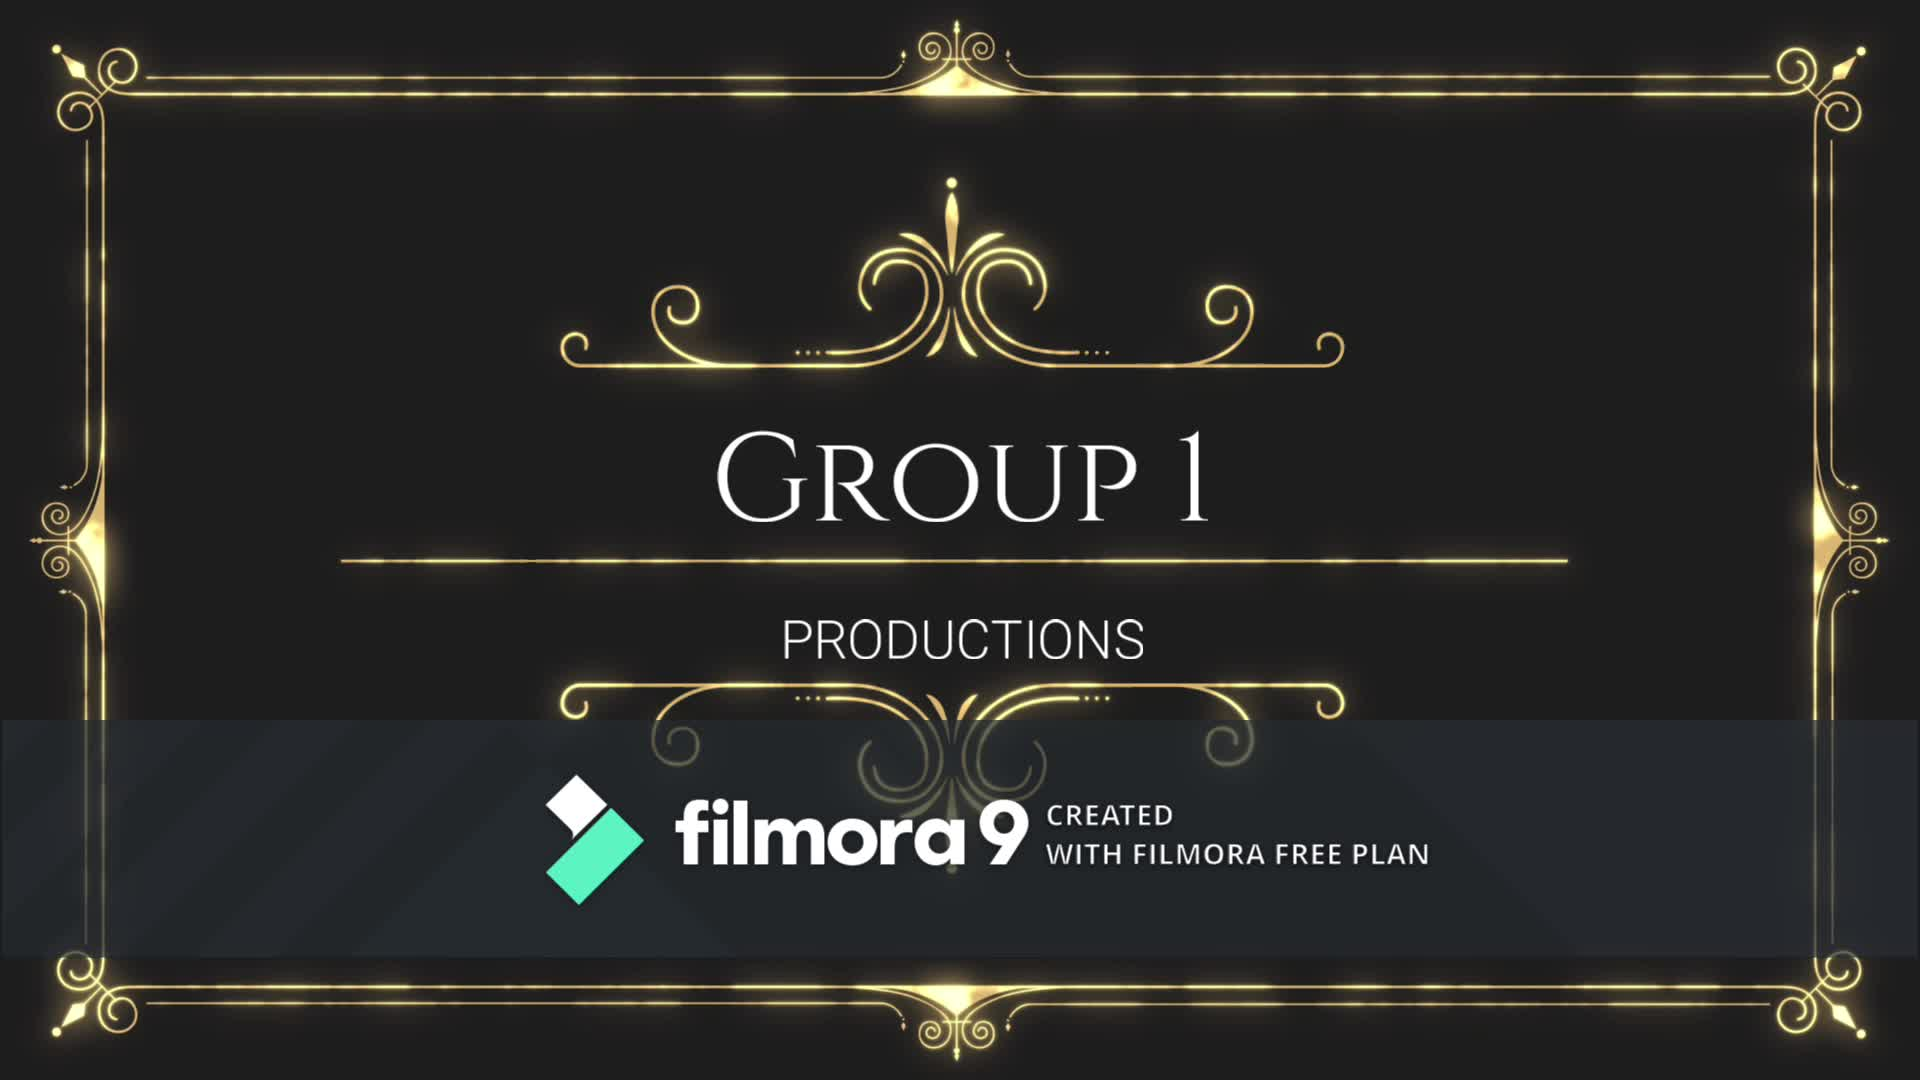 Dormont Summer Camp Movie Magic Group 1 - Super Jurassic Camp